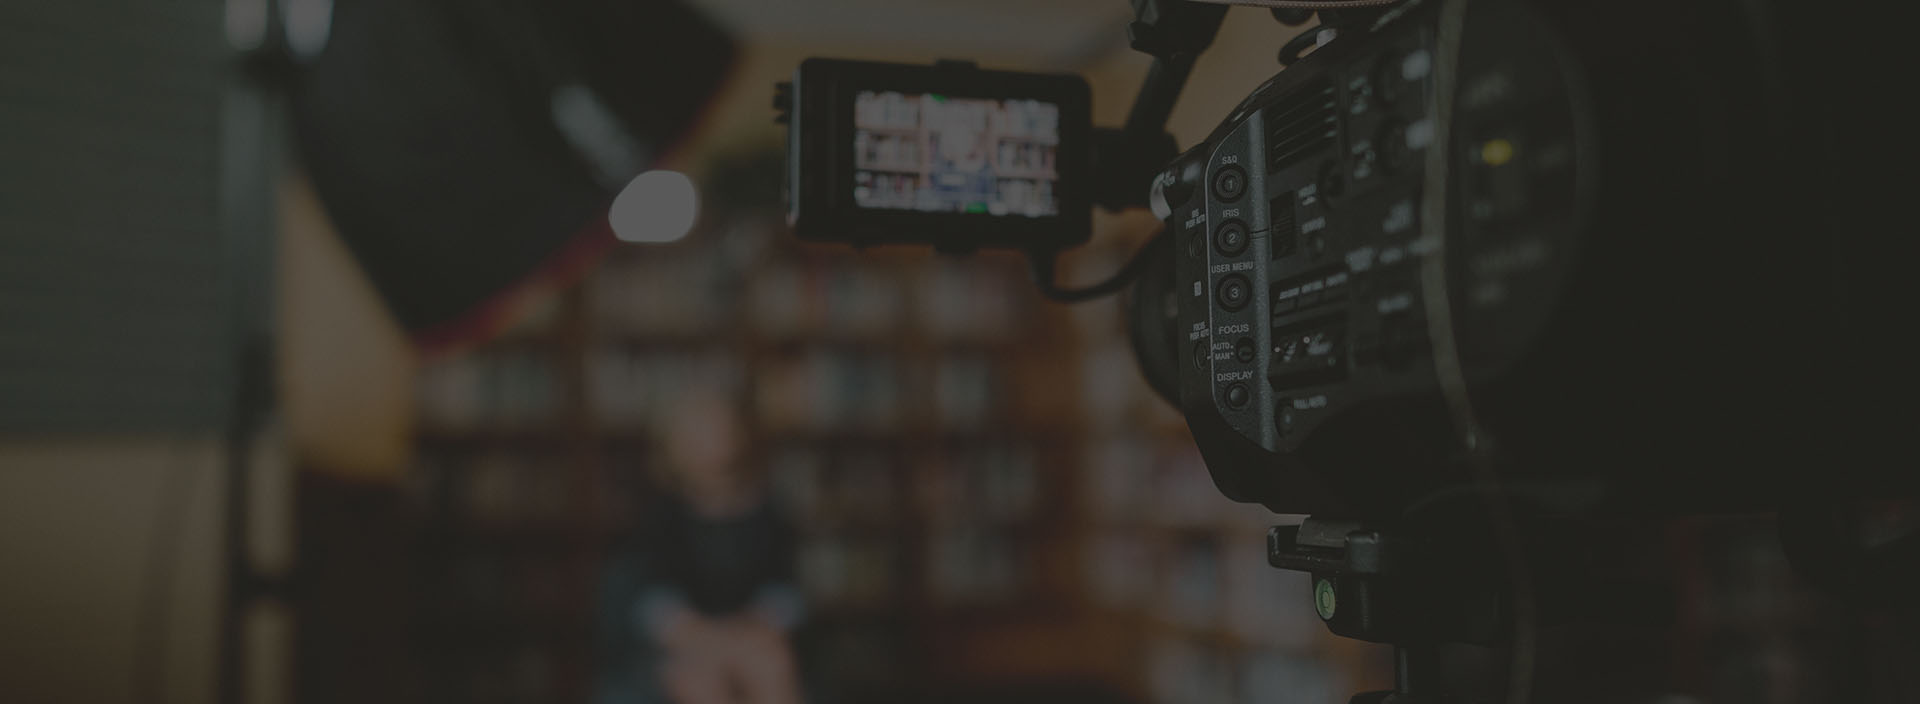 Public relations, interview